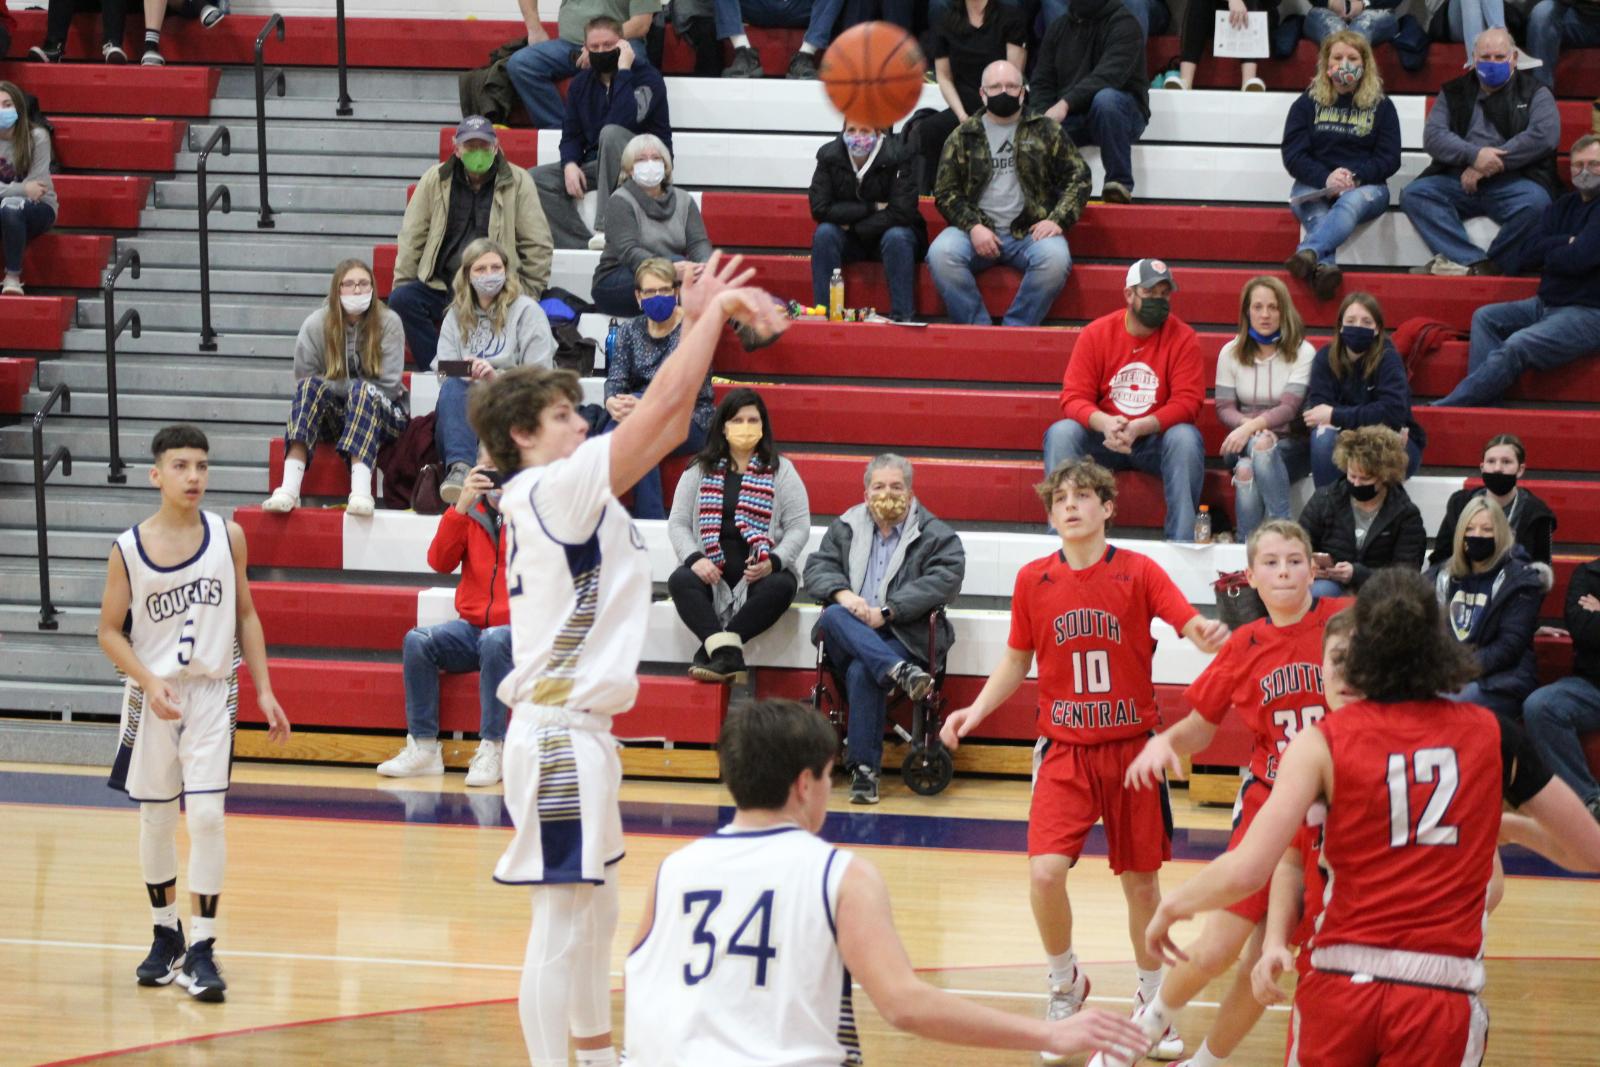 Boys JV Basketball @ South Central 1/30/21 (Photo Gallery)